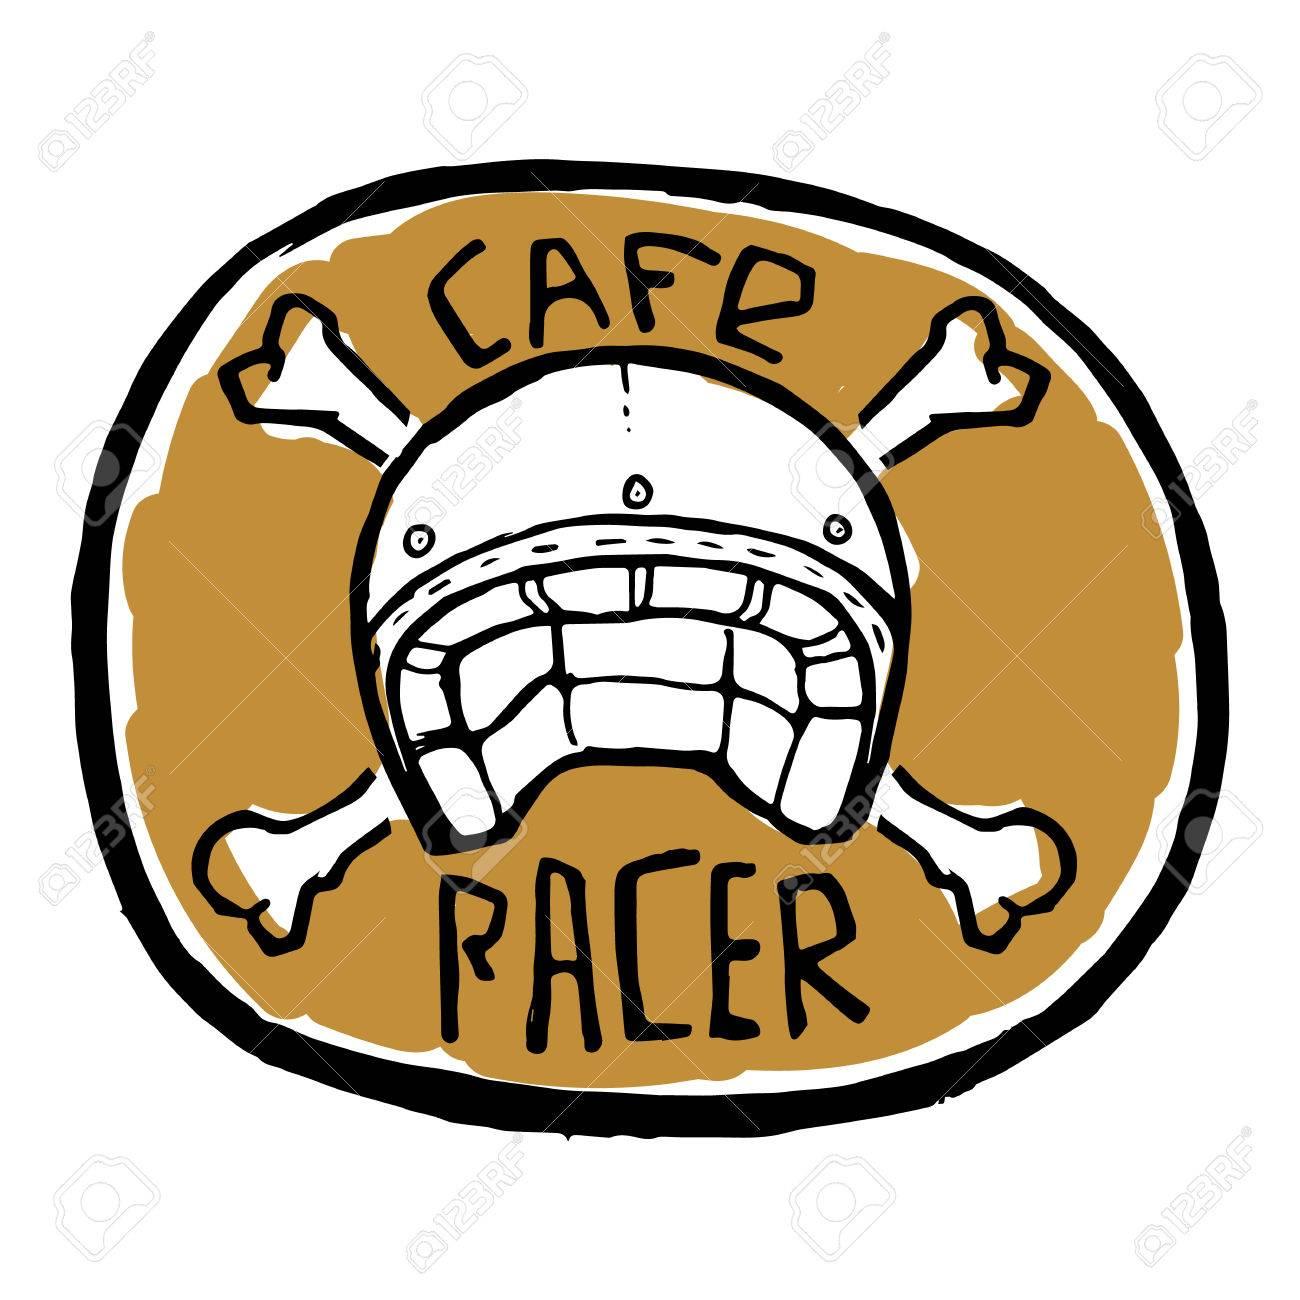 Round emblem or sticker bike helmet with crossed bones cafe racer text stock vector